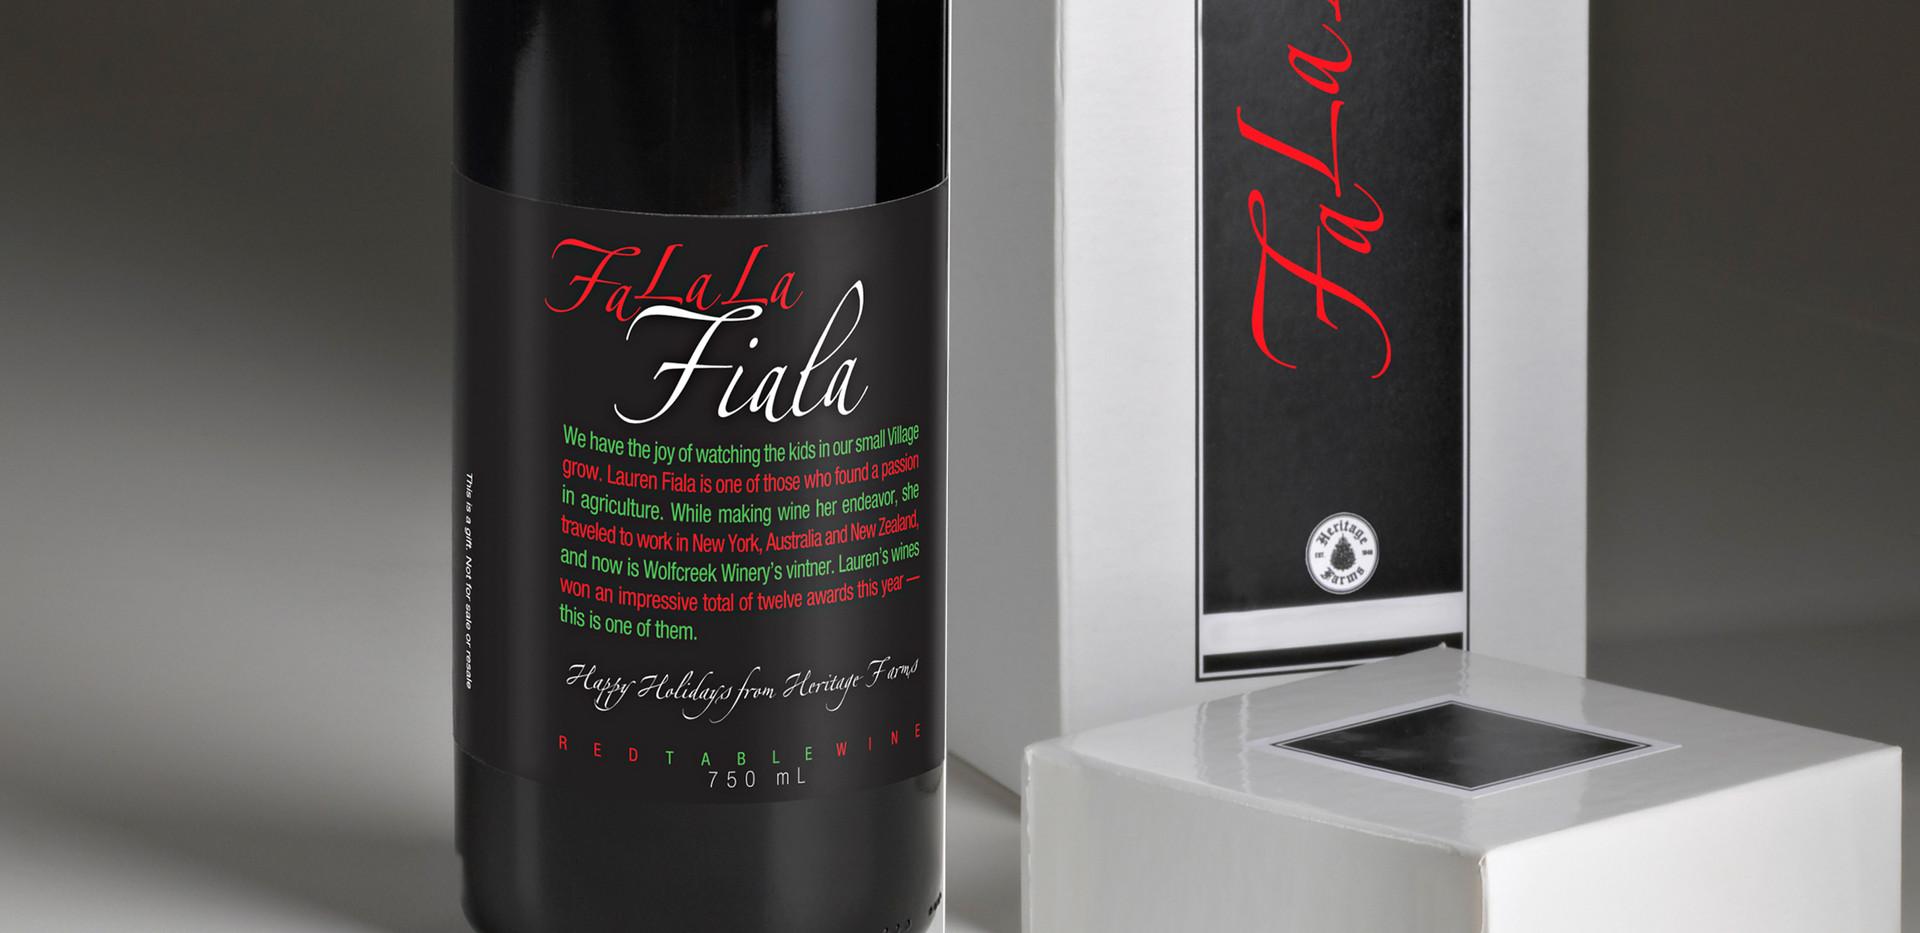 FaLaLaFiala-Promo-wf.jpg